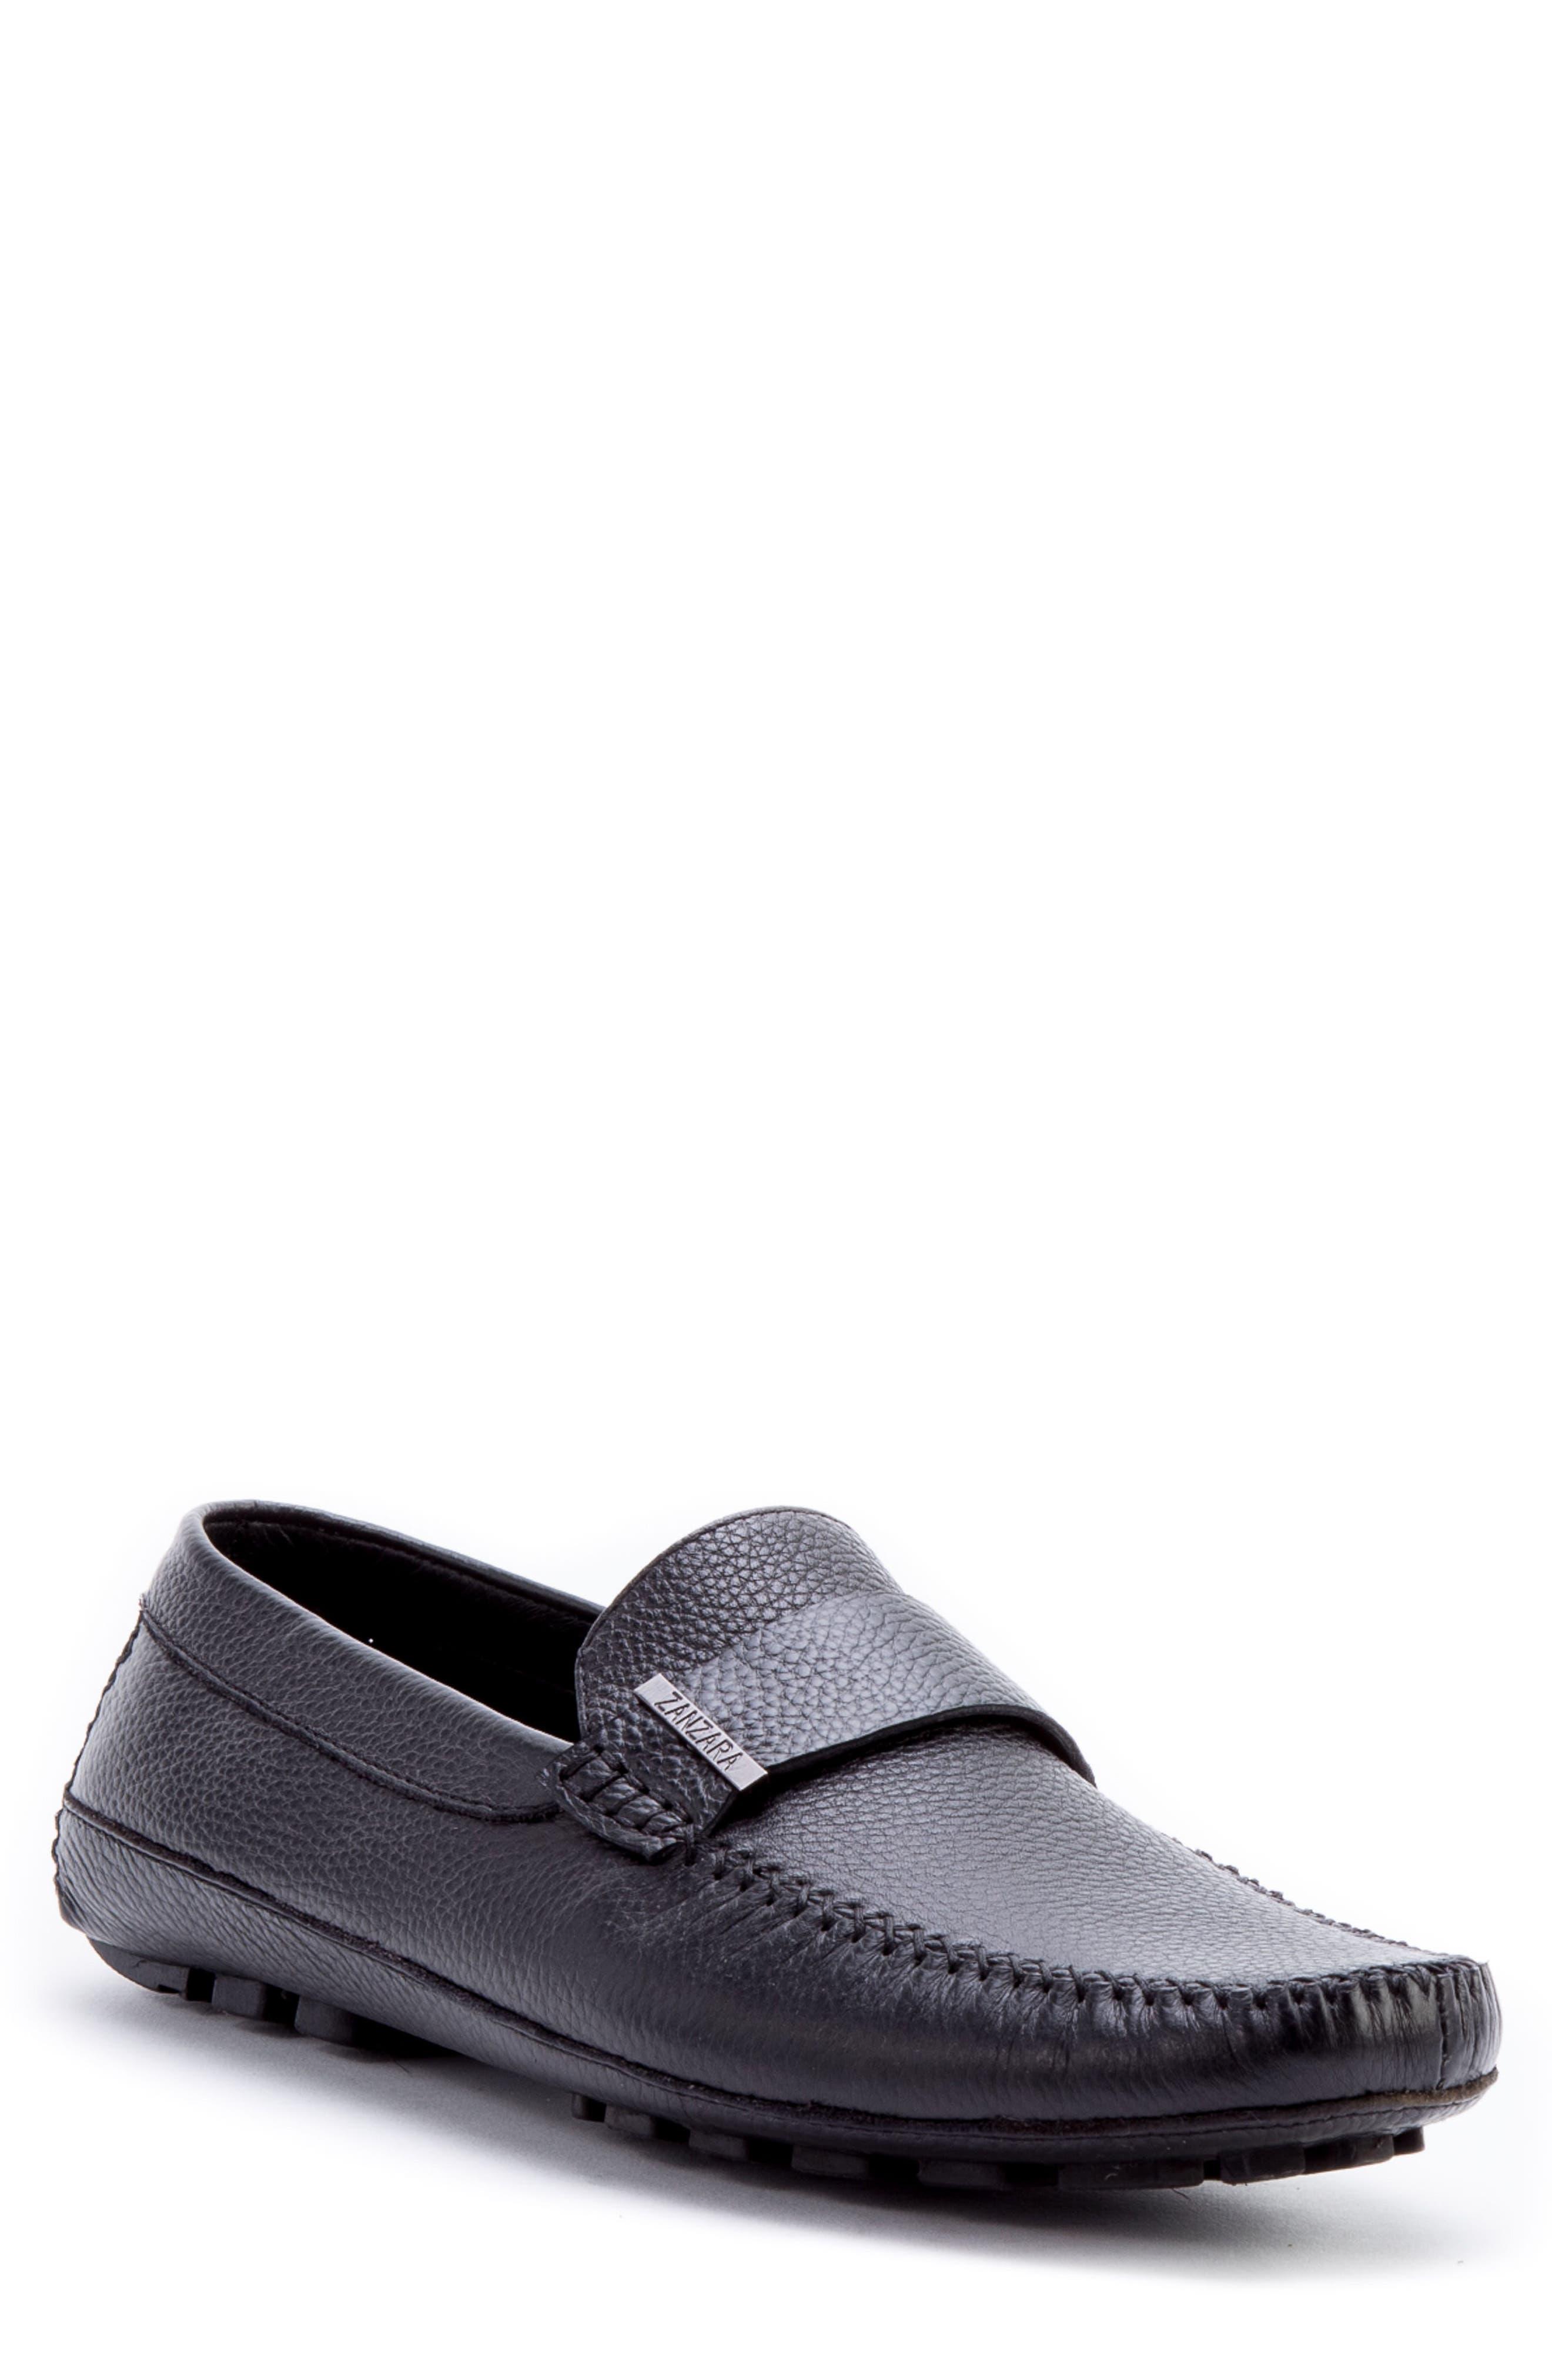 Zanzara Men's Kandinsky Moc Toe Driving Loafer tzjAd